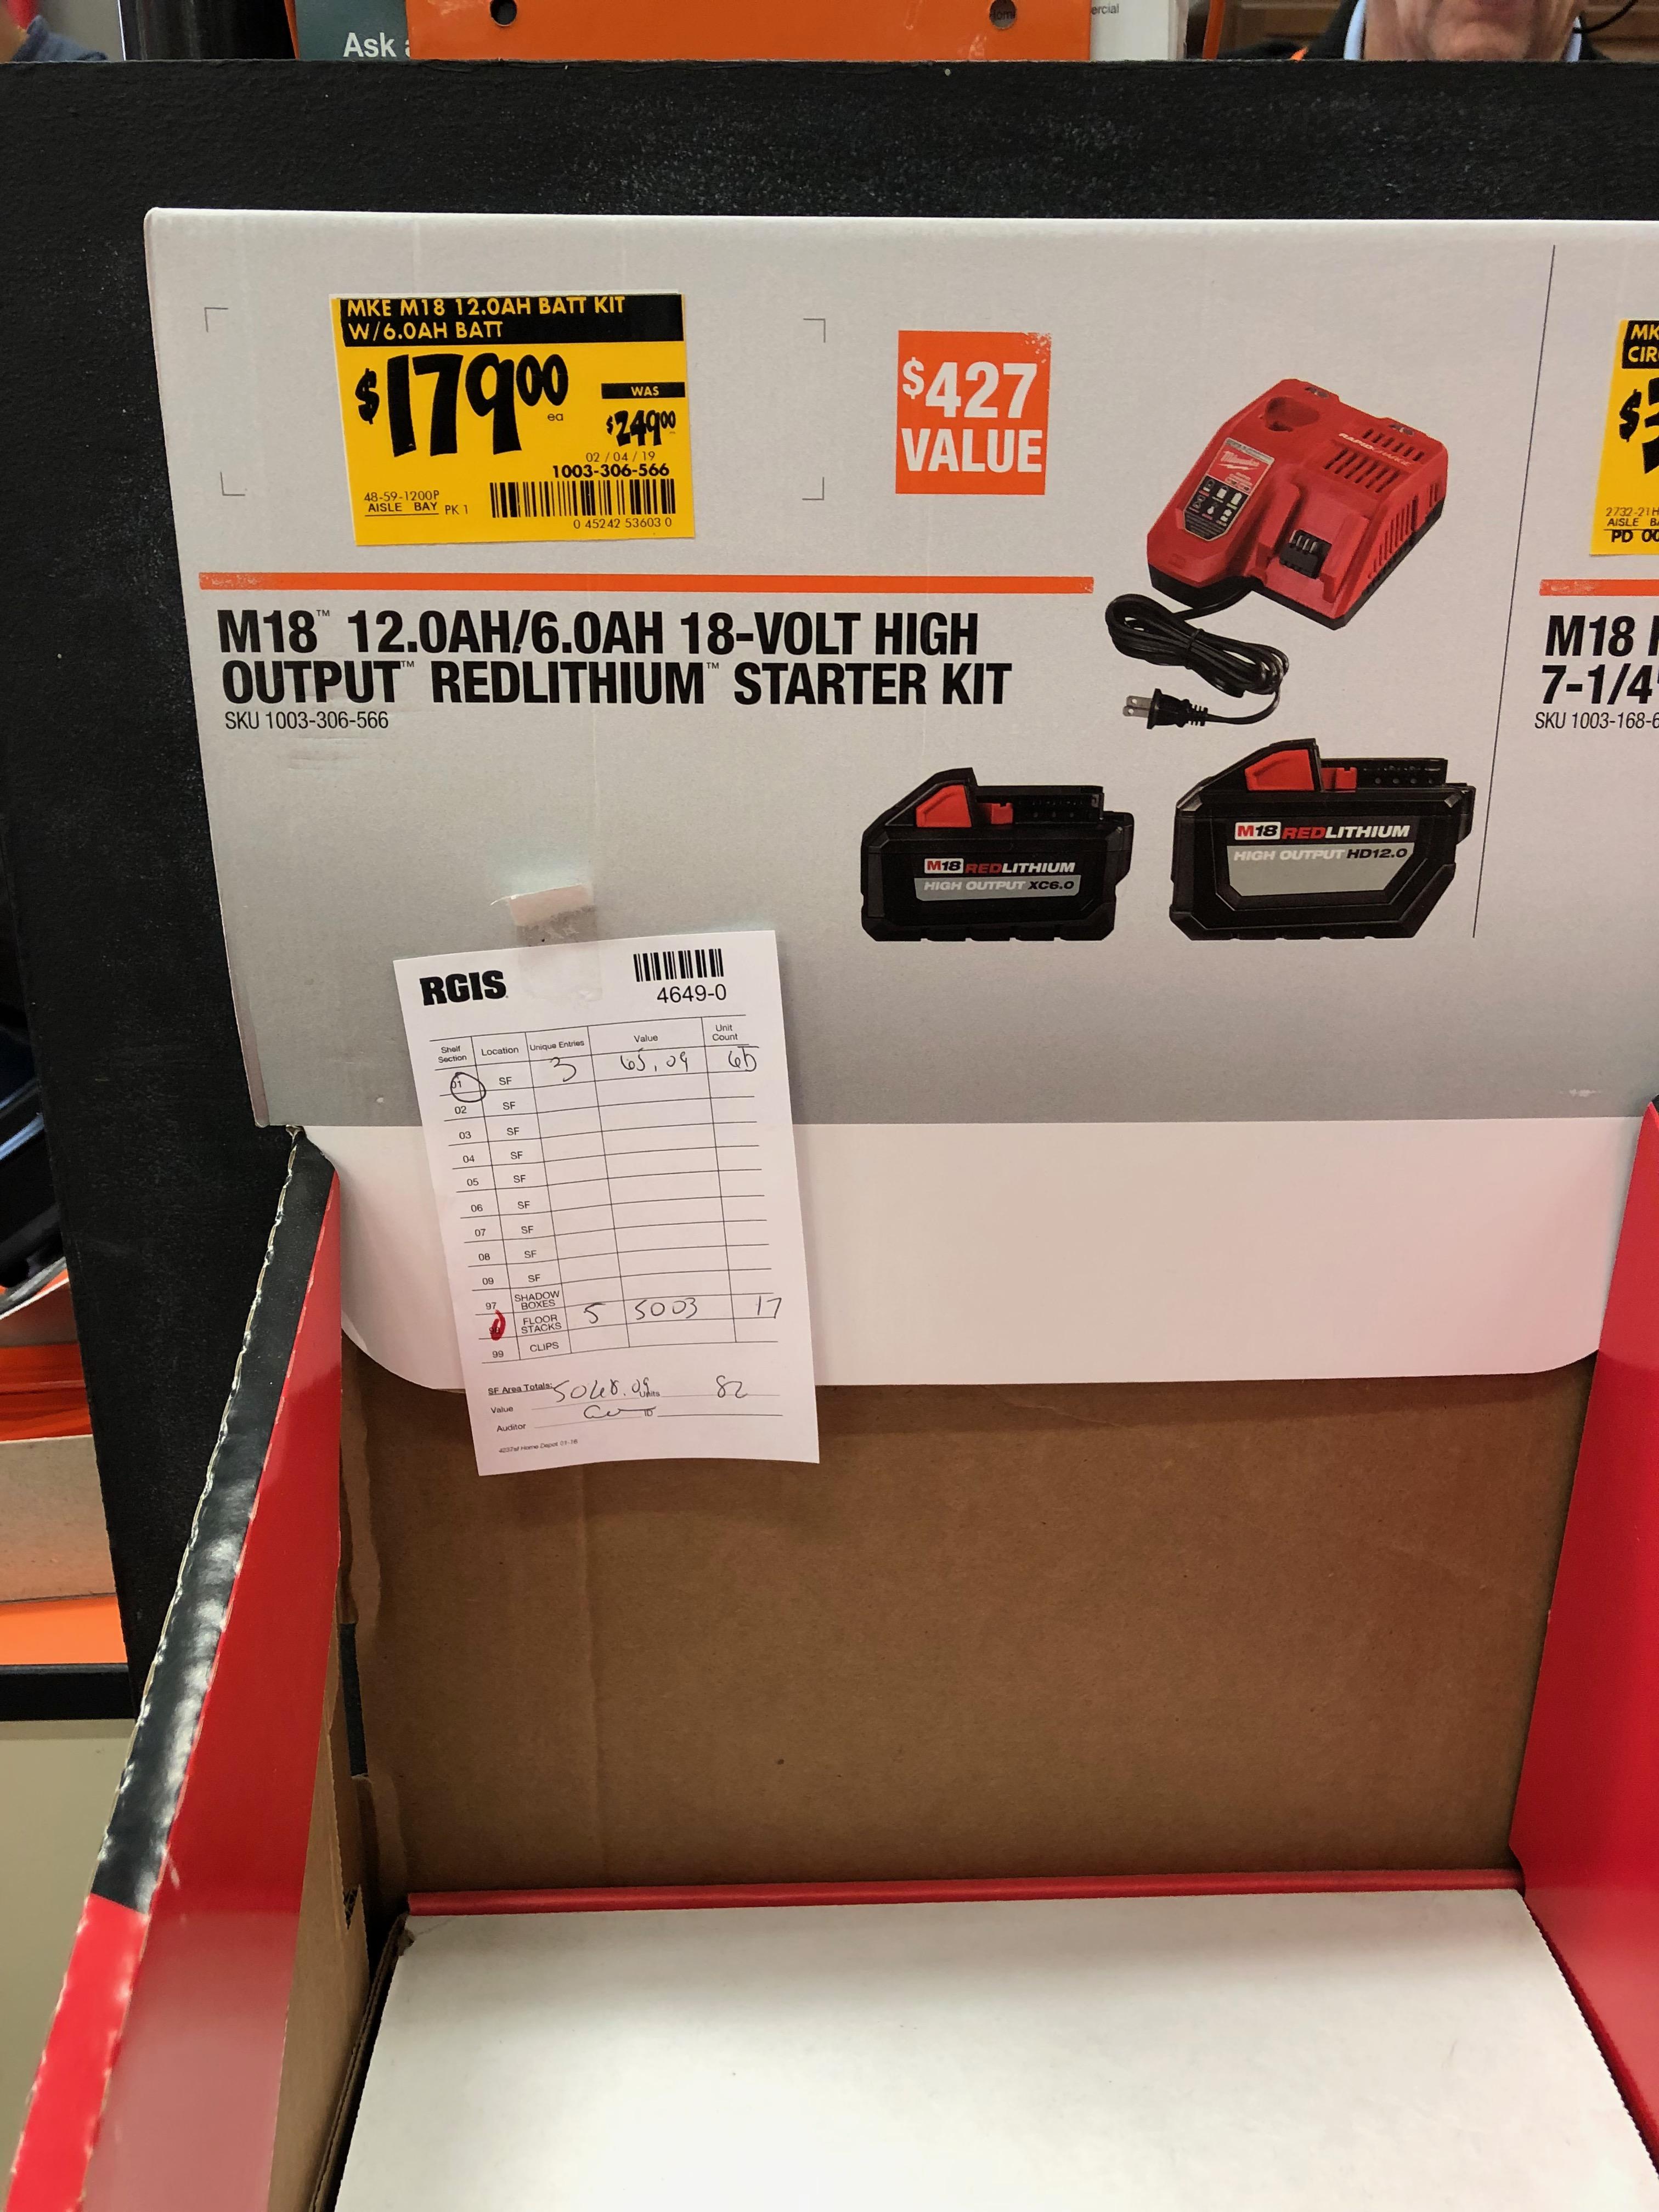 Milwaukee M18 XC HO Batteries 6.0 and 12.0 starter kit $179 @ Home Depot YMMV